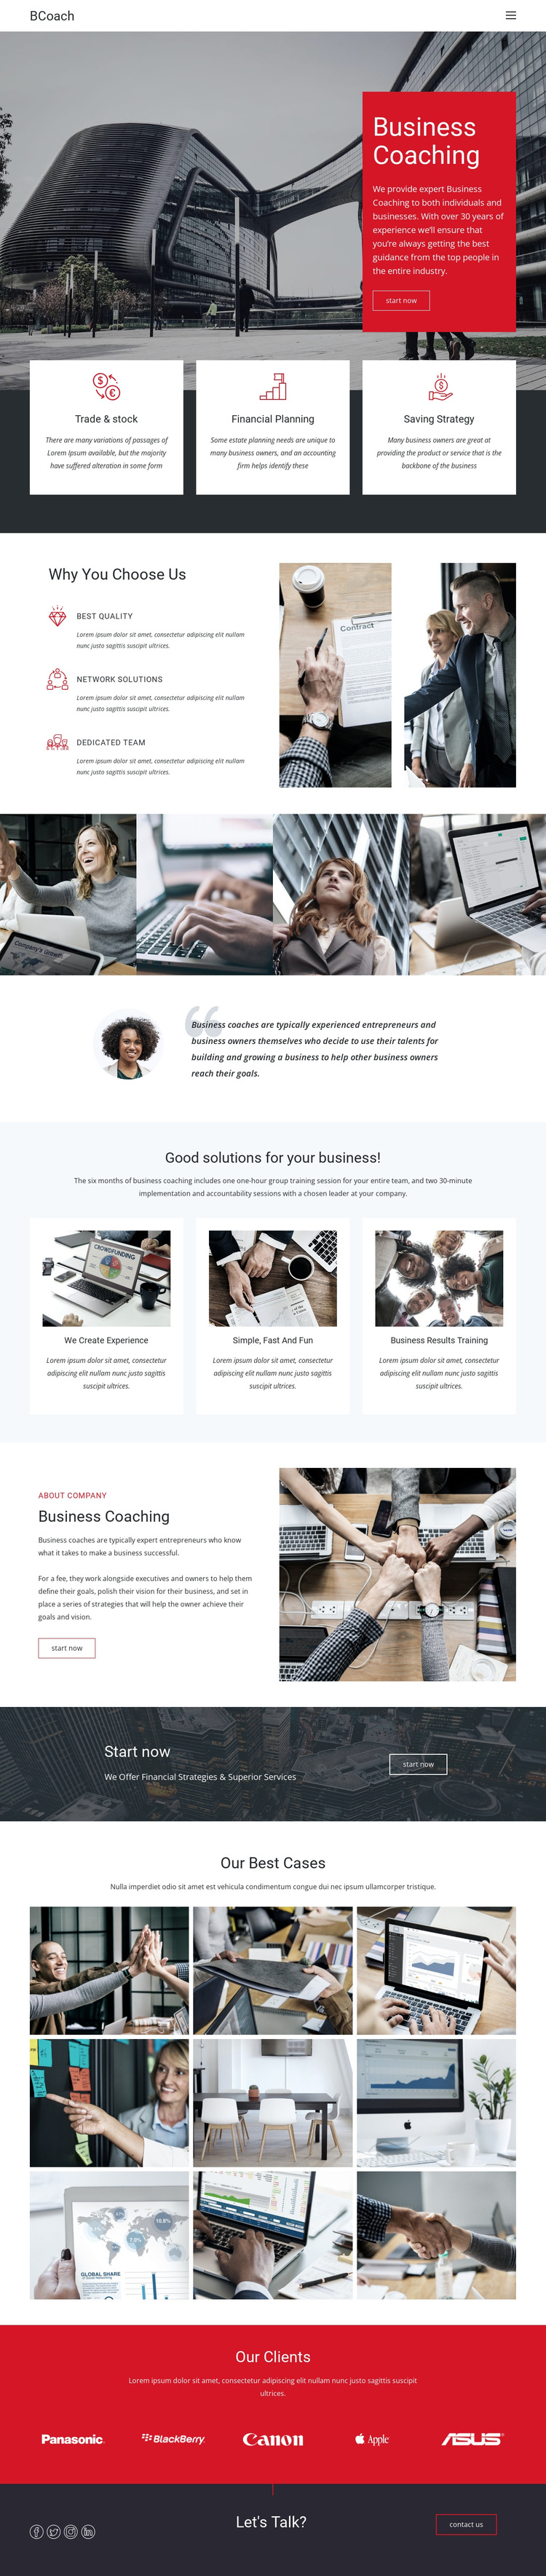 Executive coaching Joomla Template